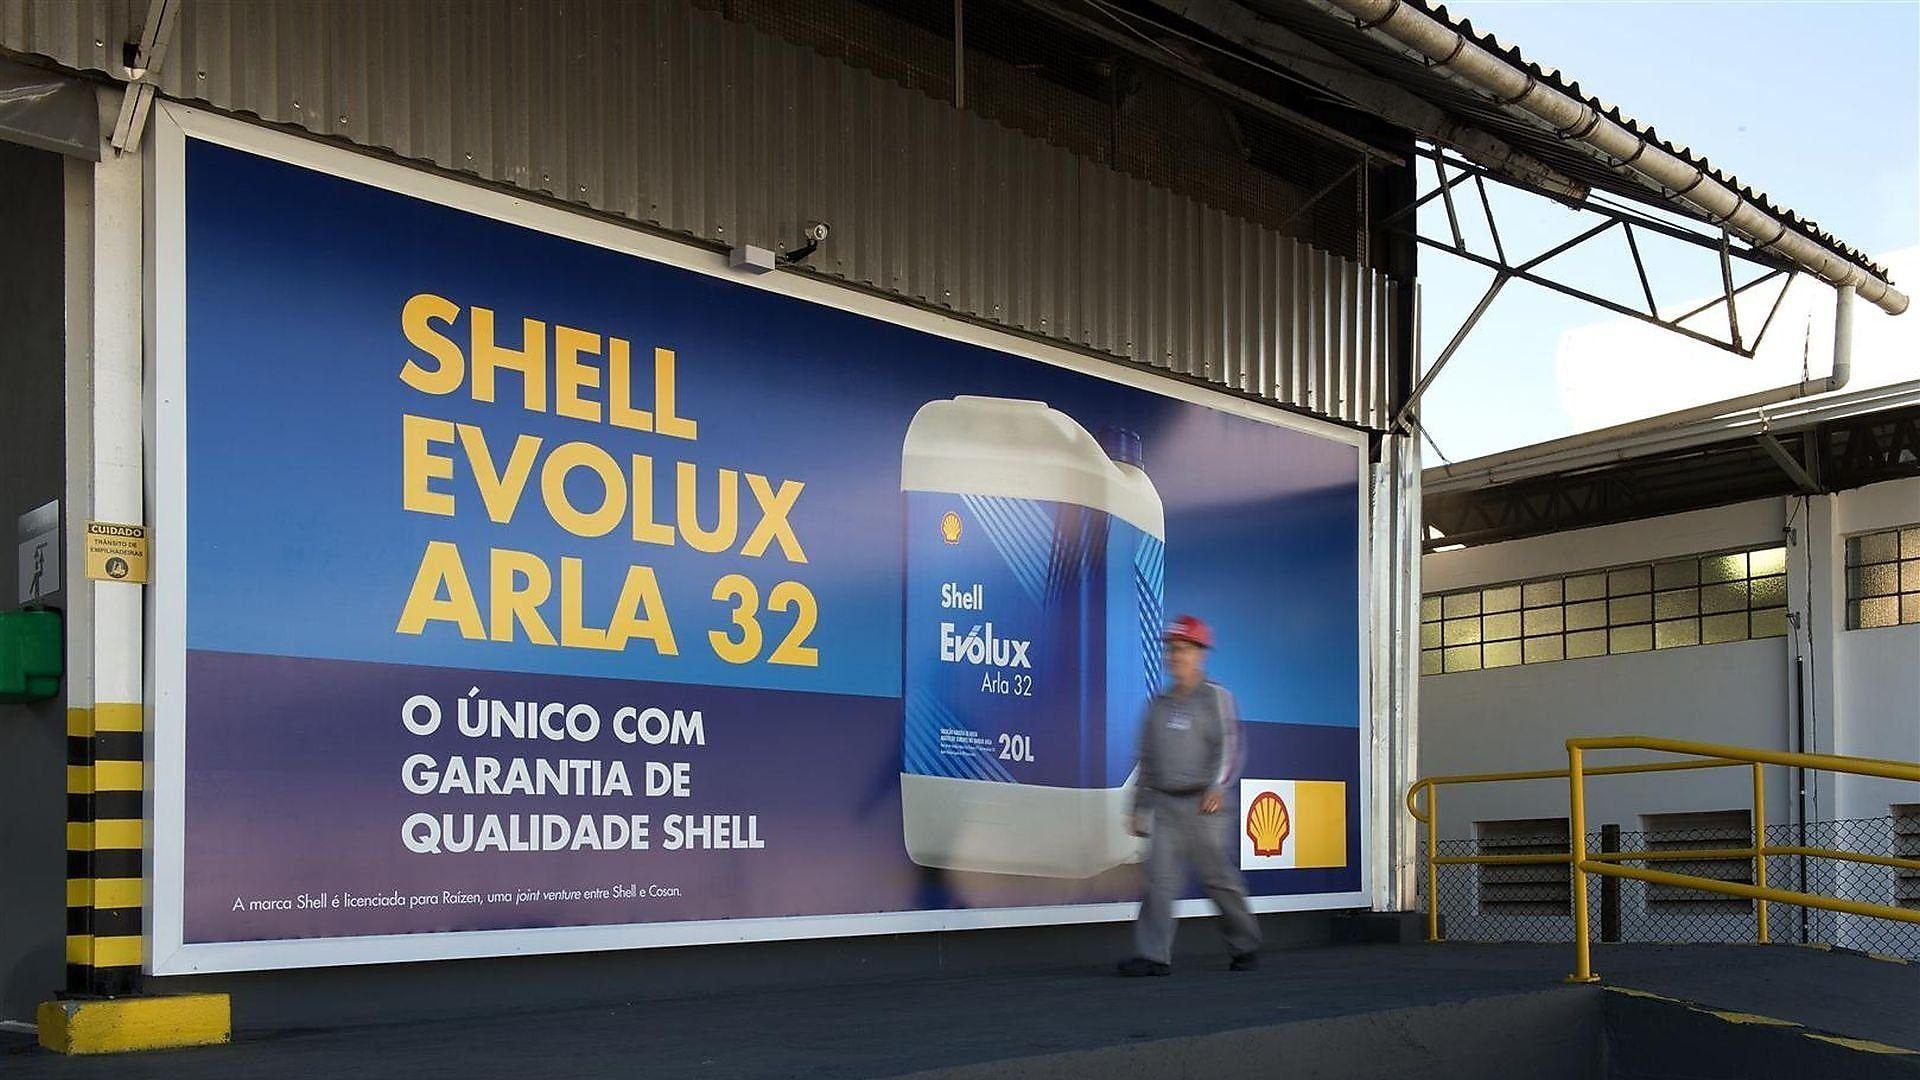 propaganda de arla 32 shell evolux